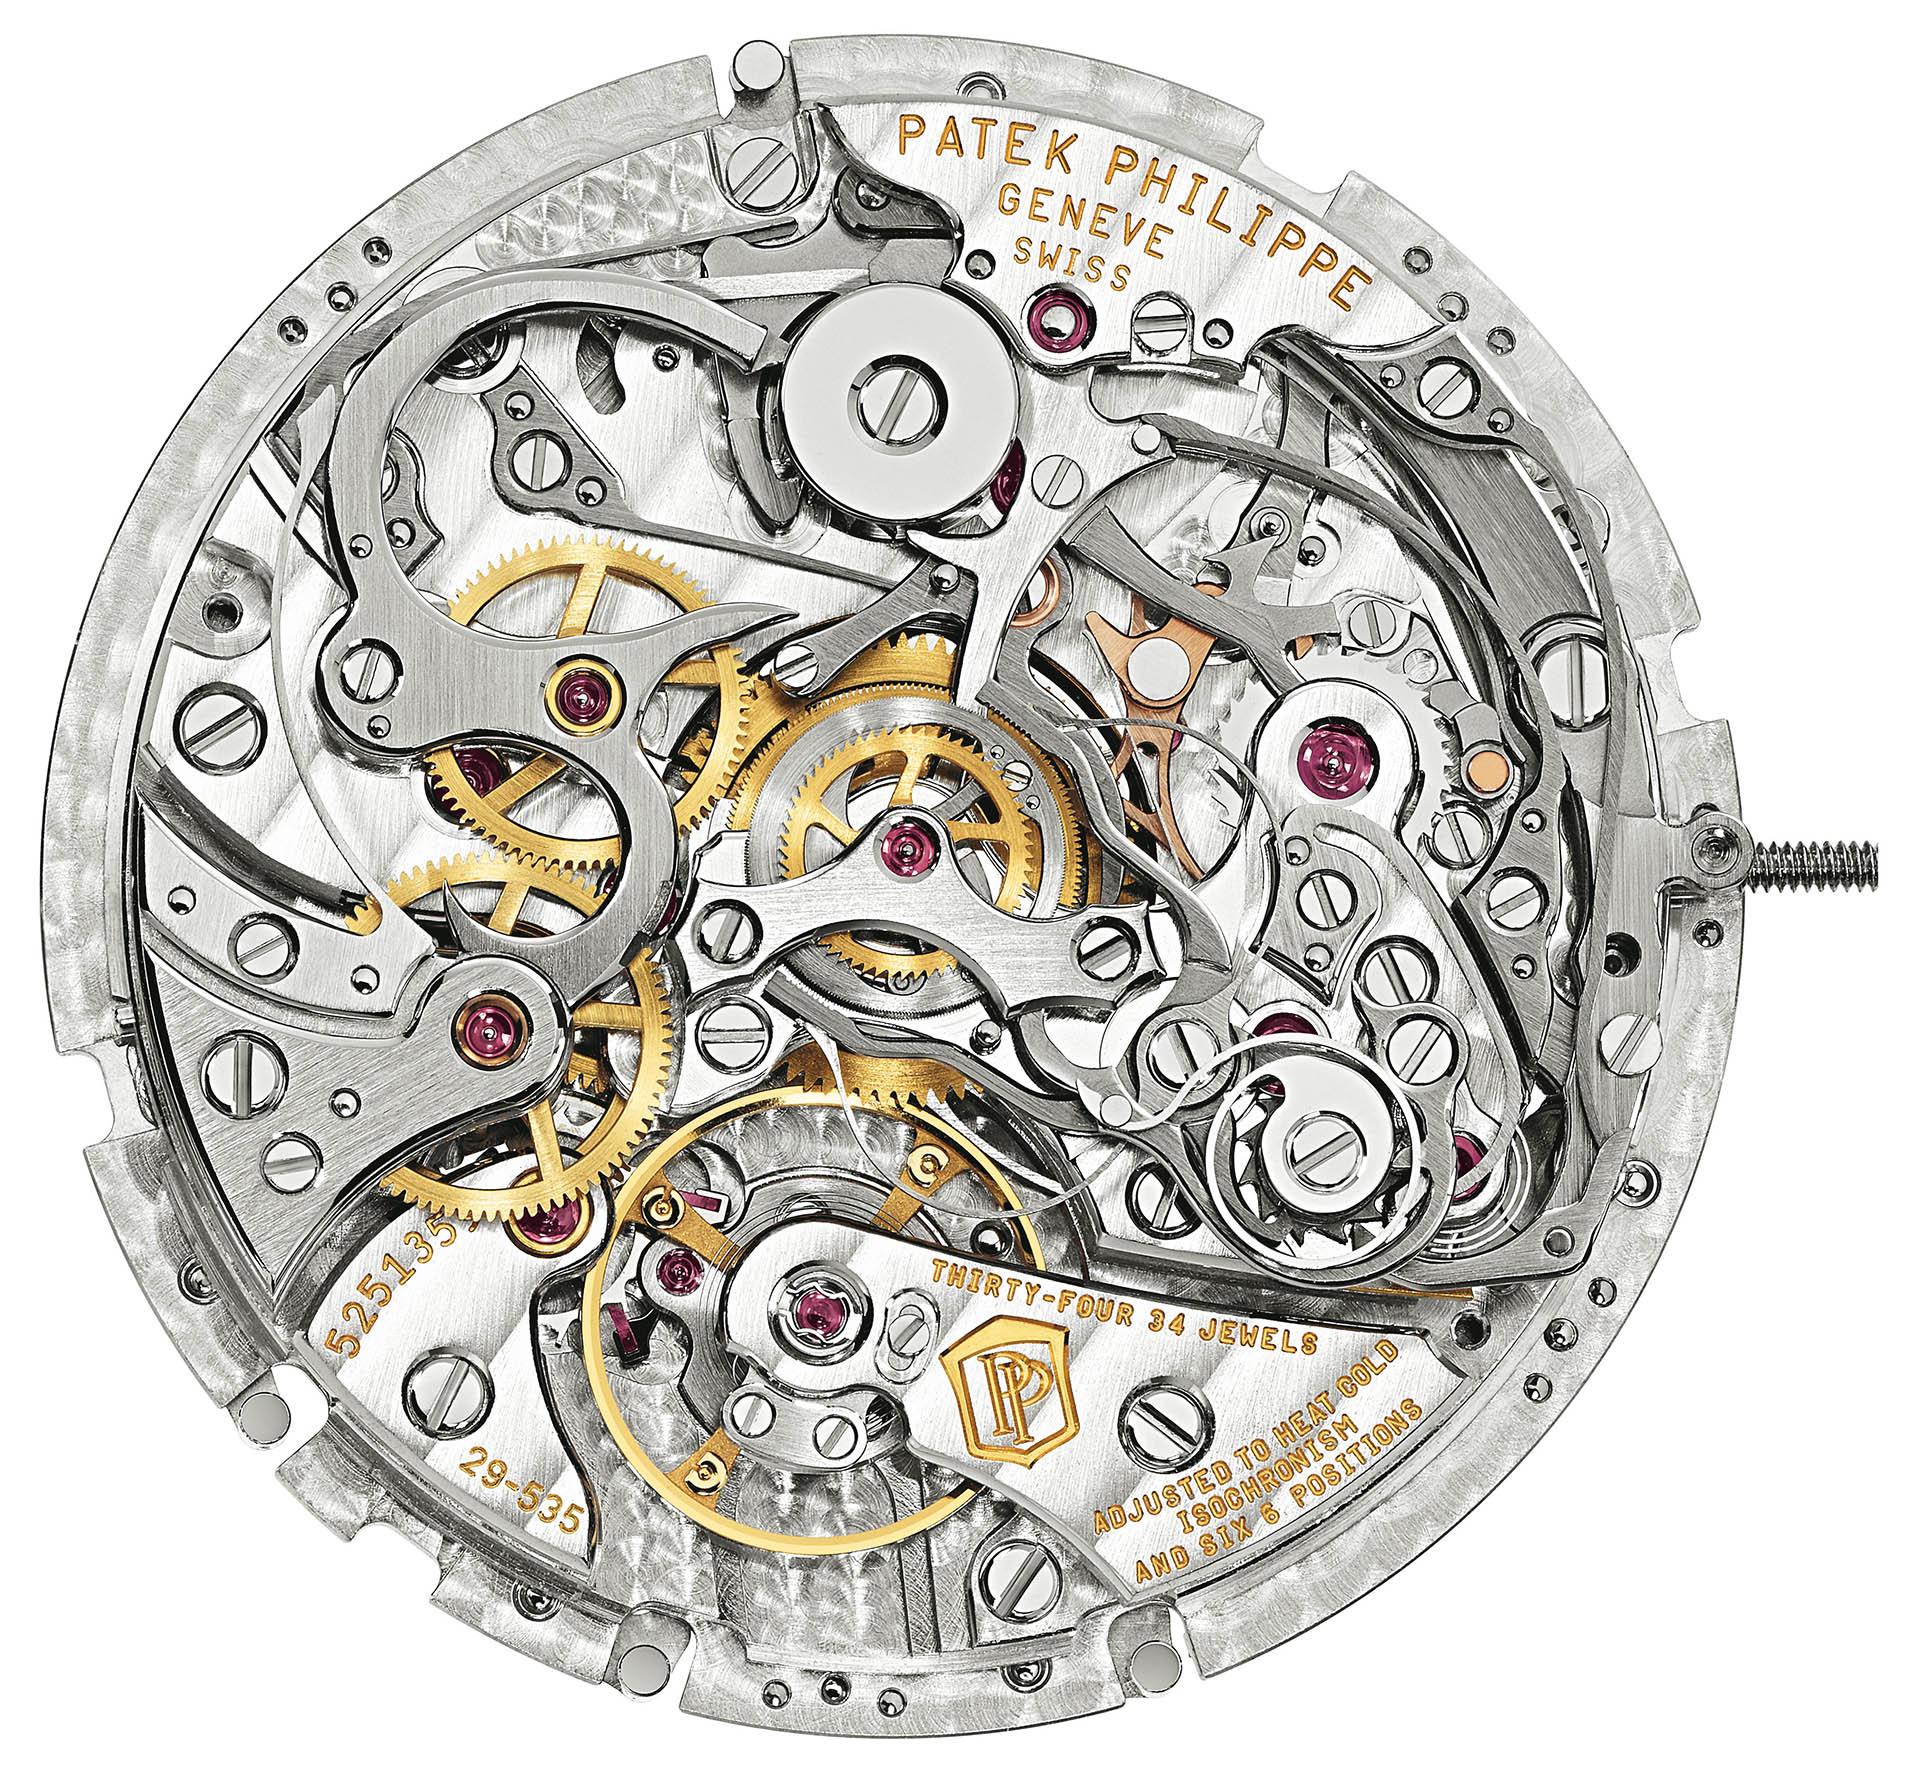 Patek Philippe Schleppzeiger-Chronograph Rattrapante